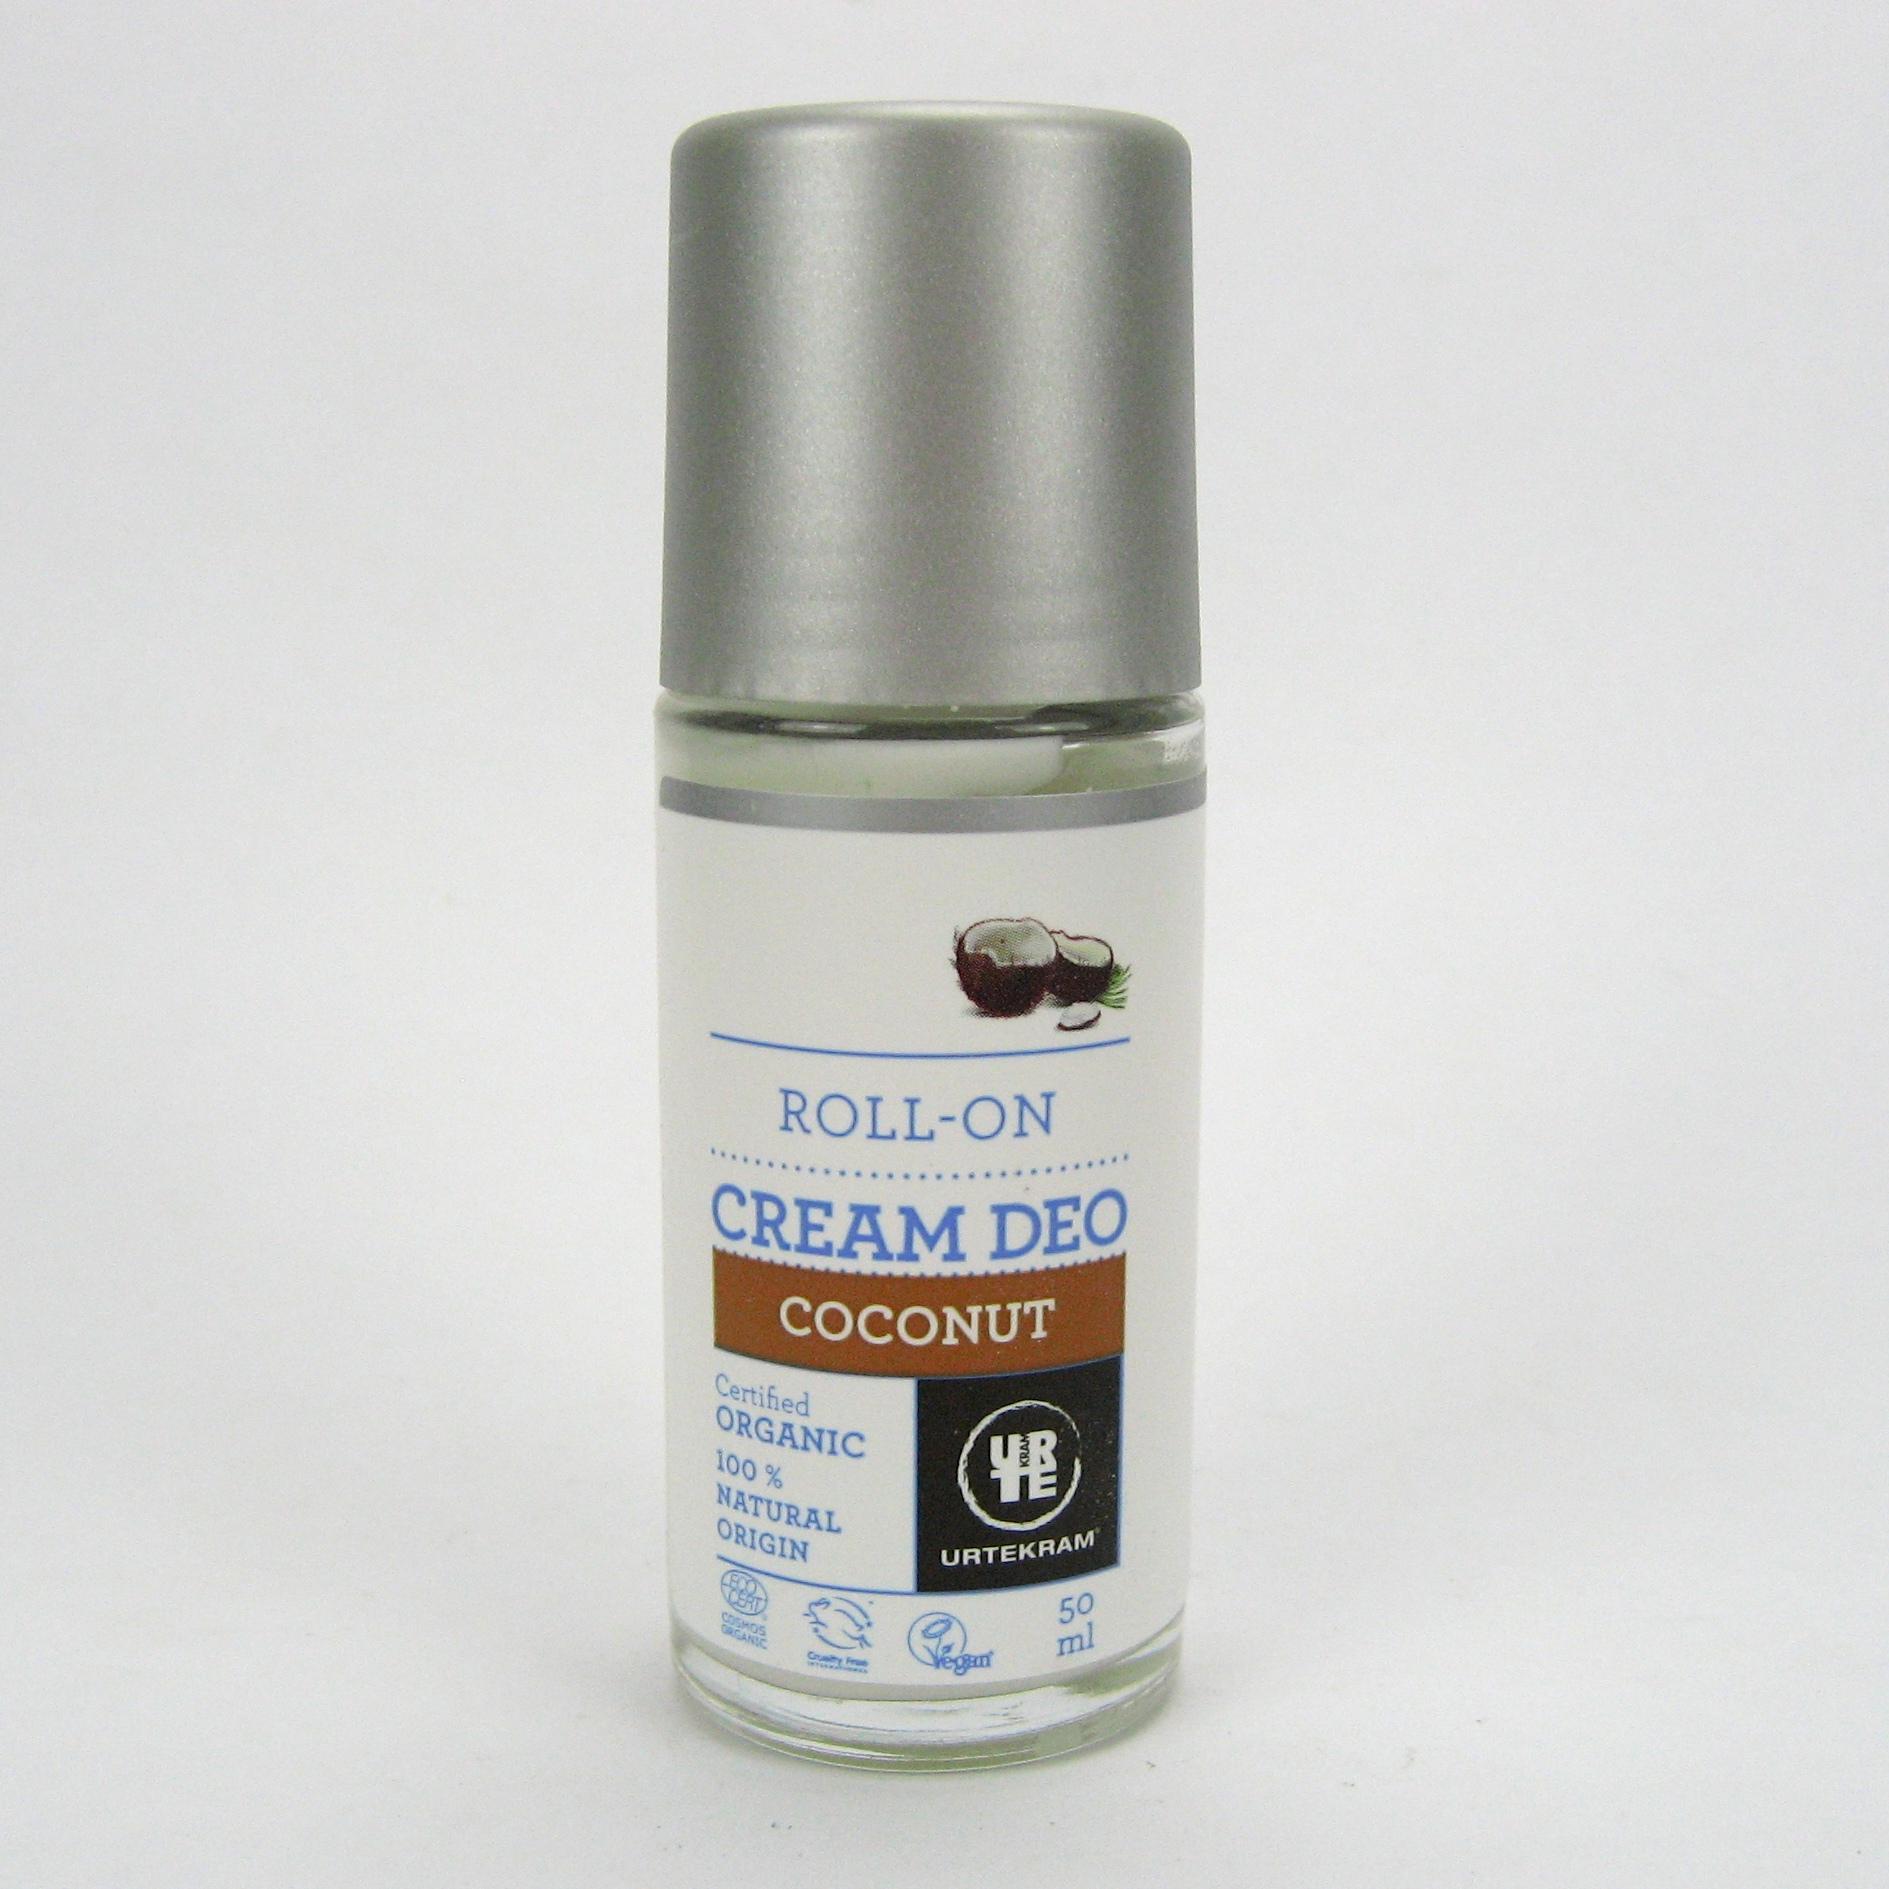 Kookose deodorant Urtekram, 50 ml